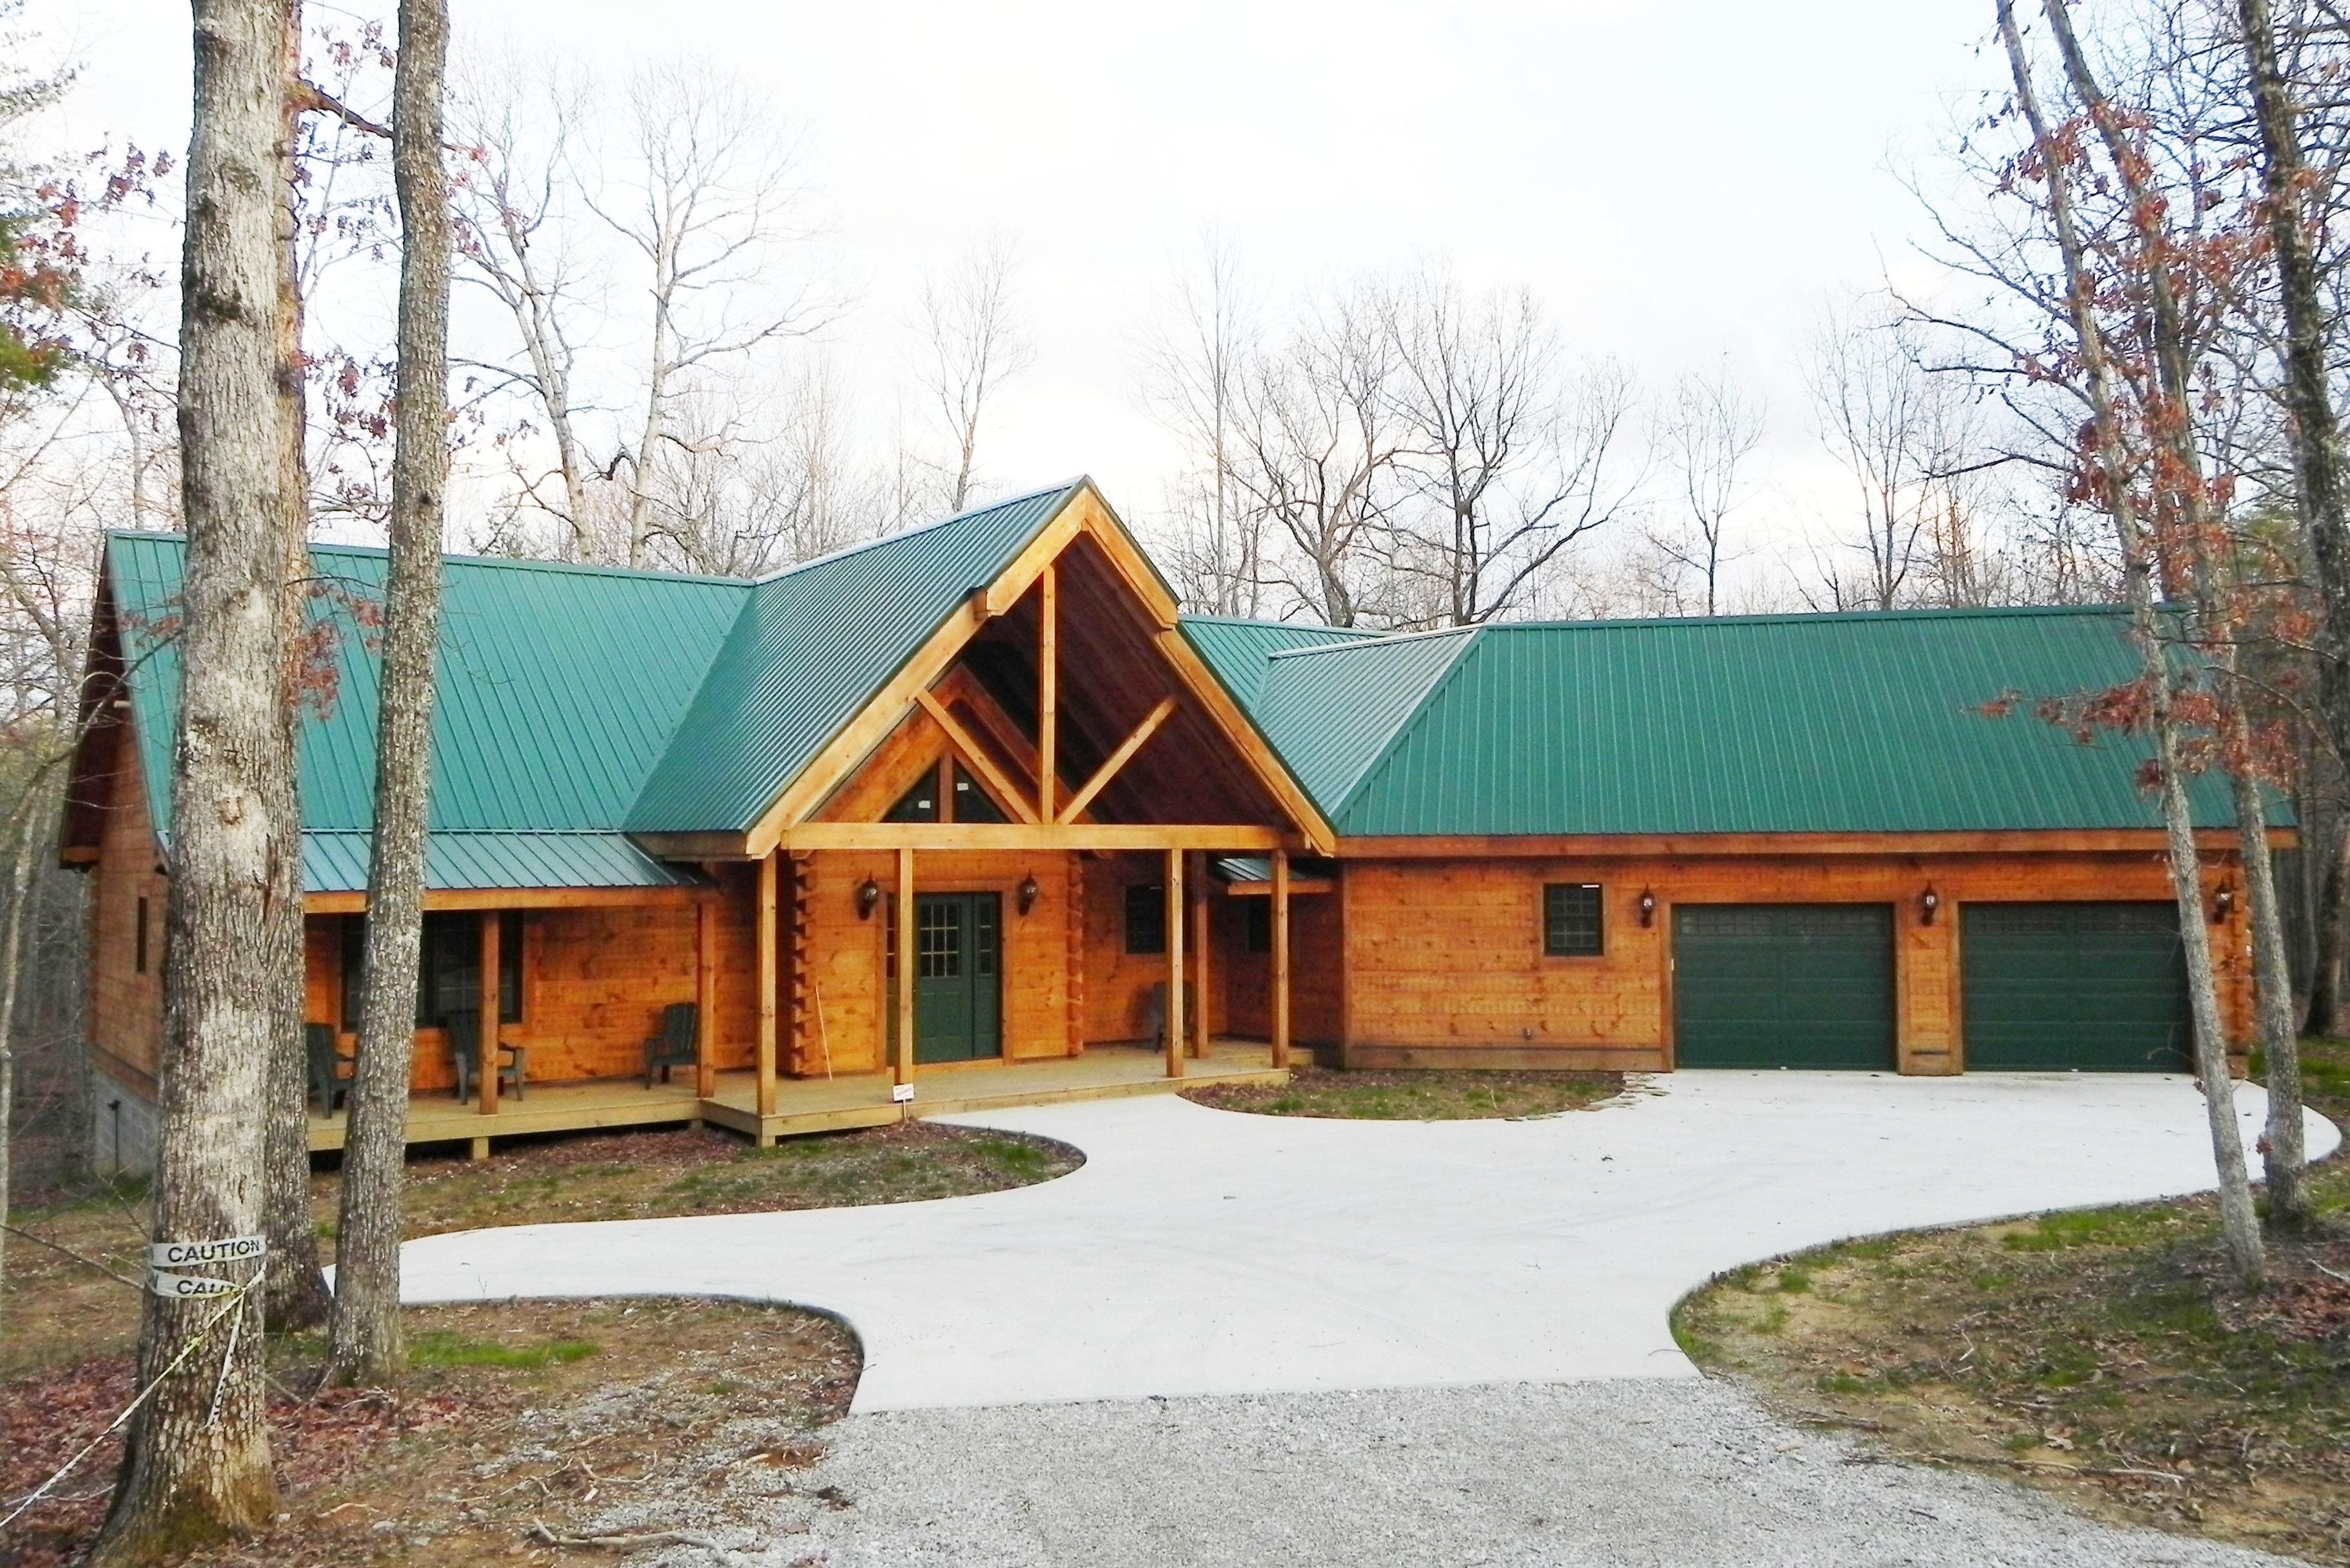 Countrymark Log Homes image 2